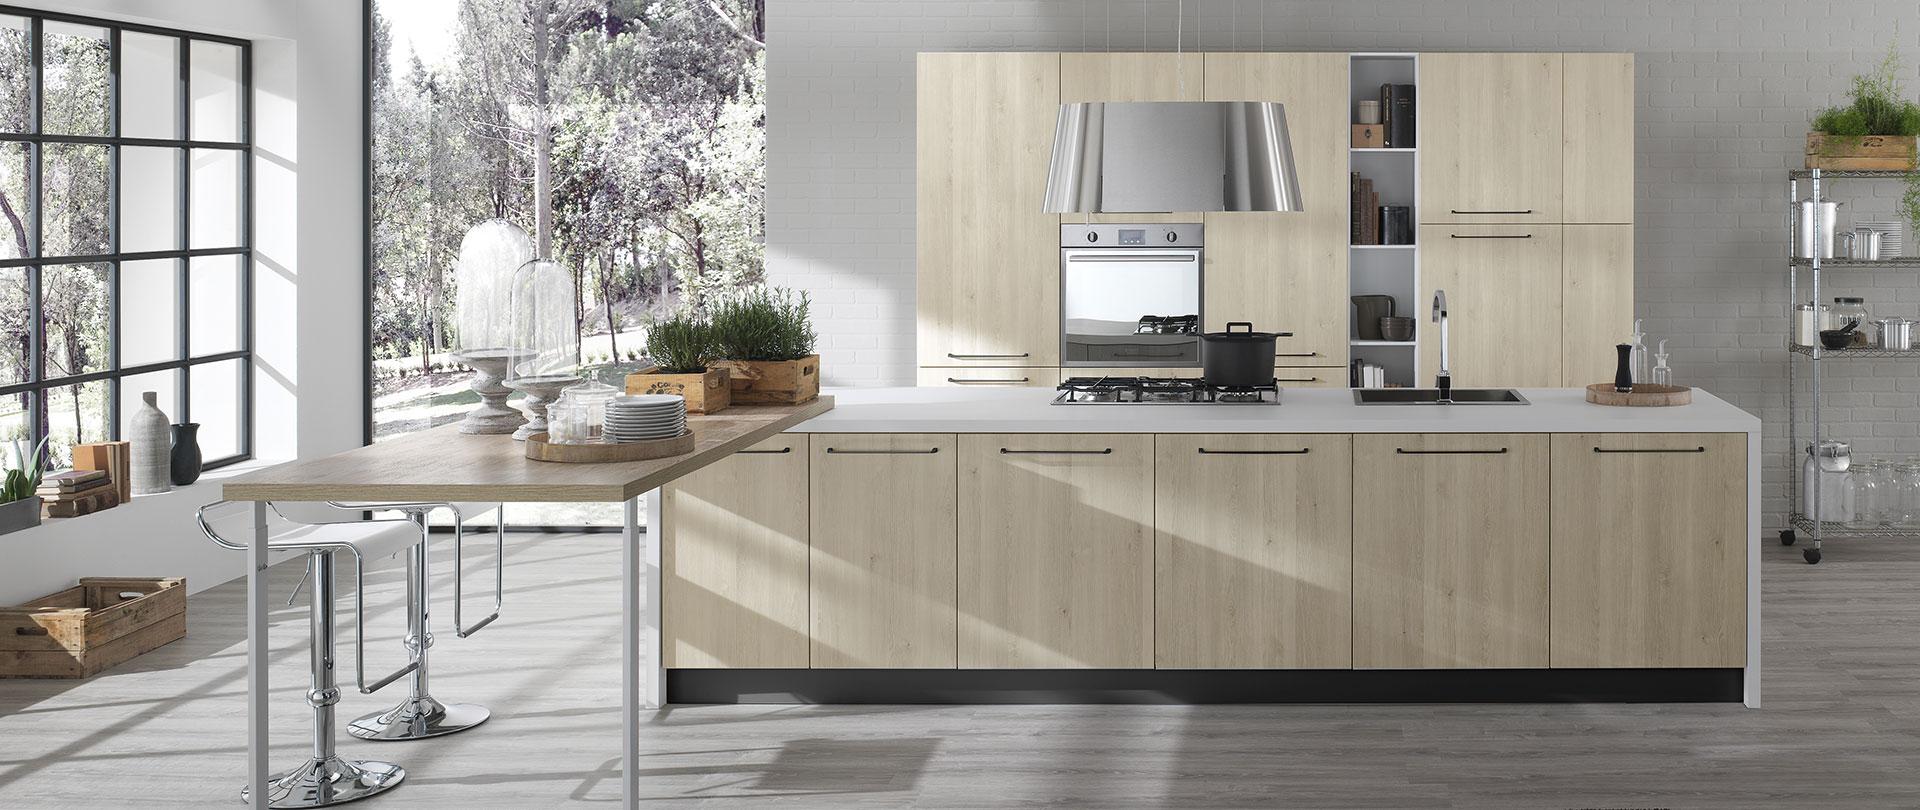 evo-cucina-aurora_rovere-beige